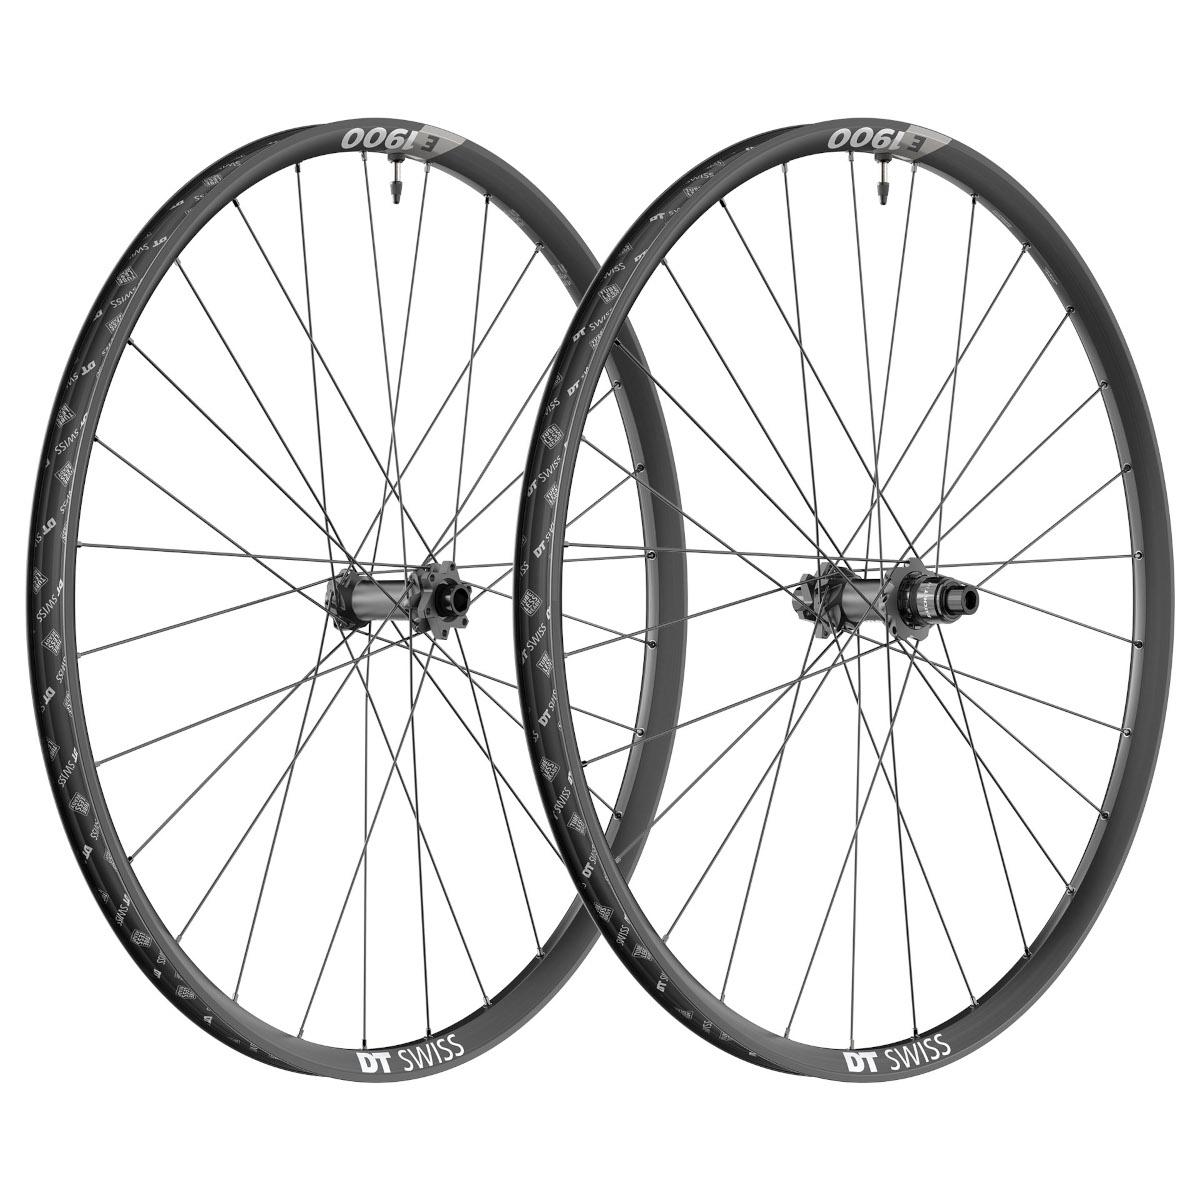 "DT Swiss E 1900 Spline 29"" MTB Wheelset - Centerlock - FW: 15x110mm | RW: 12x148mm - 30mm"